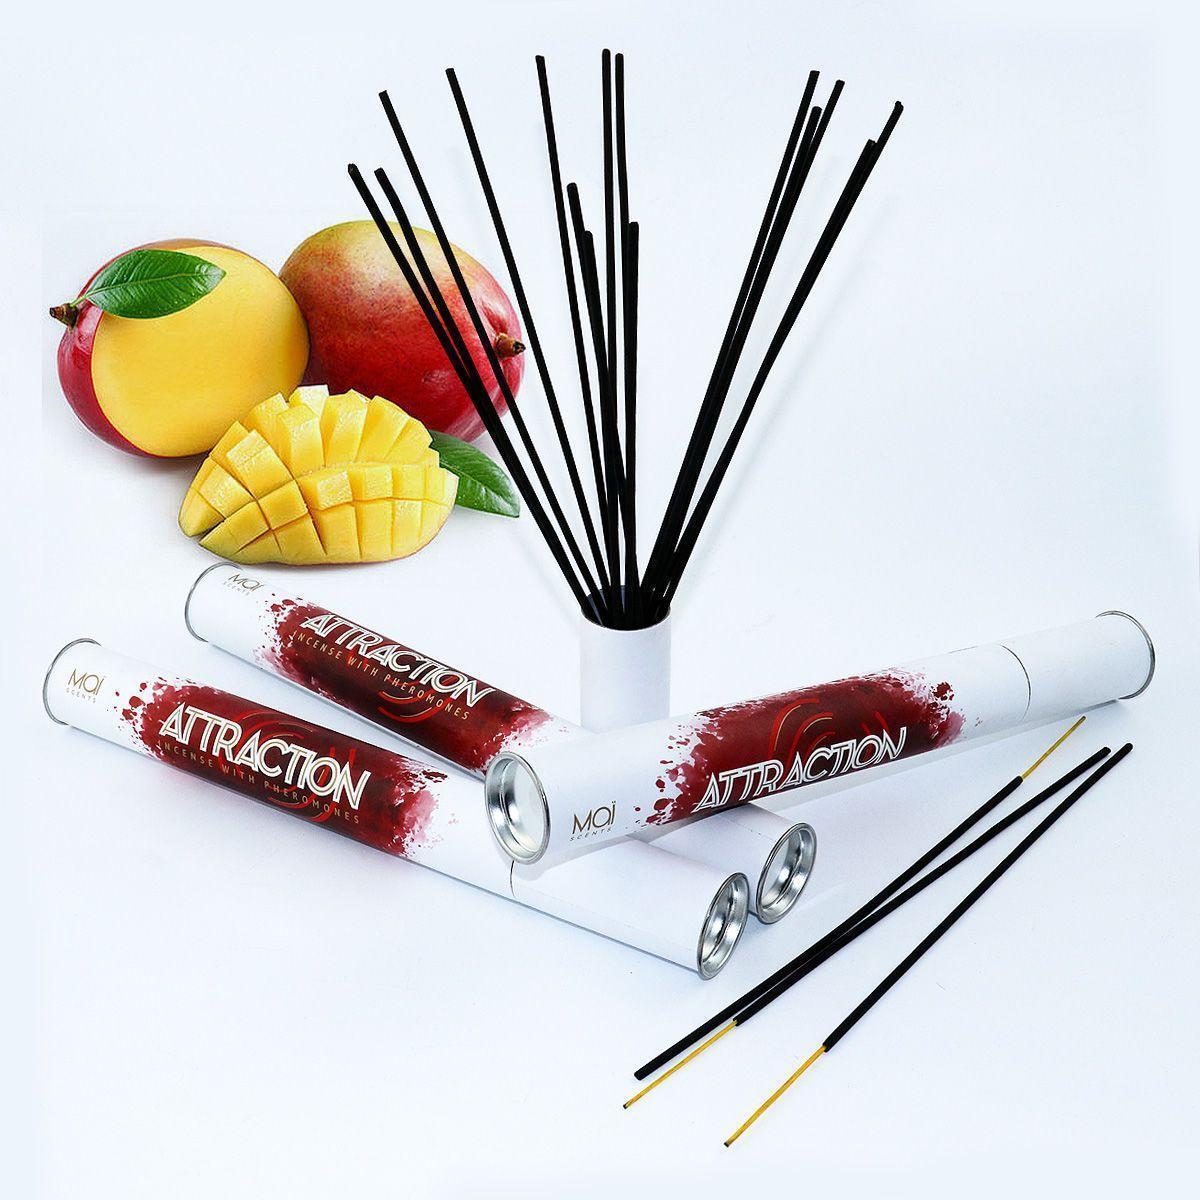 Ароматические палочки с феромонами и ароматом манго MAI Mango (20 шт) для дома, офиса, магазина